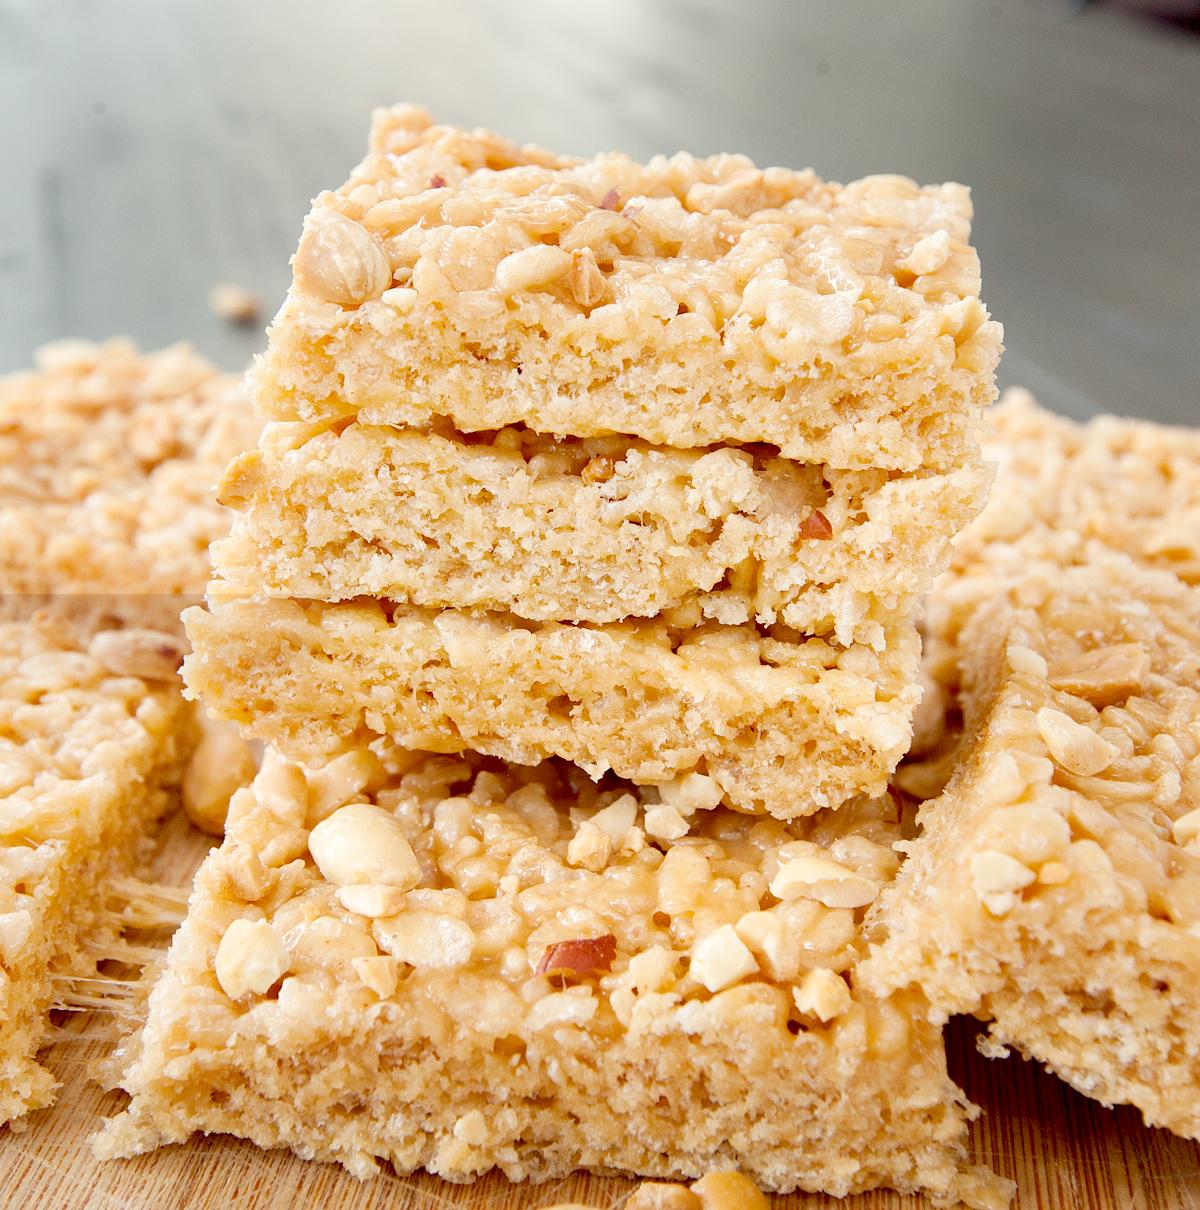 A stack of ooey gooey peanut butter rice krispie bars